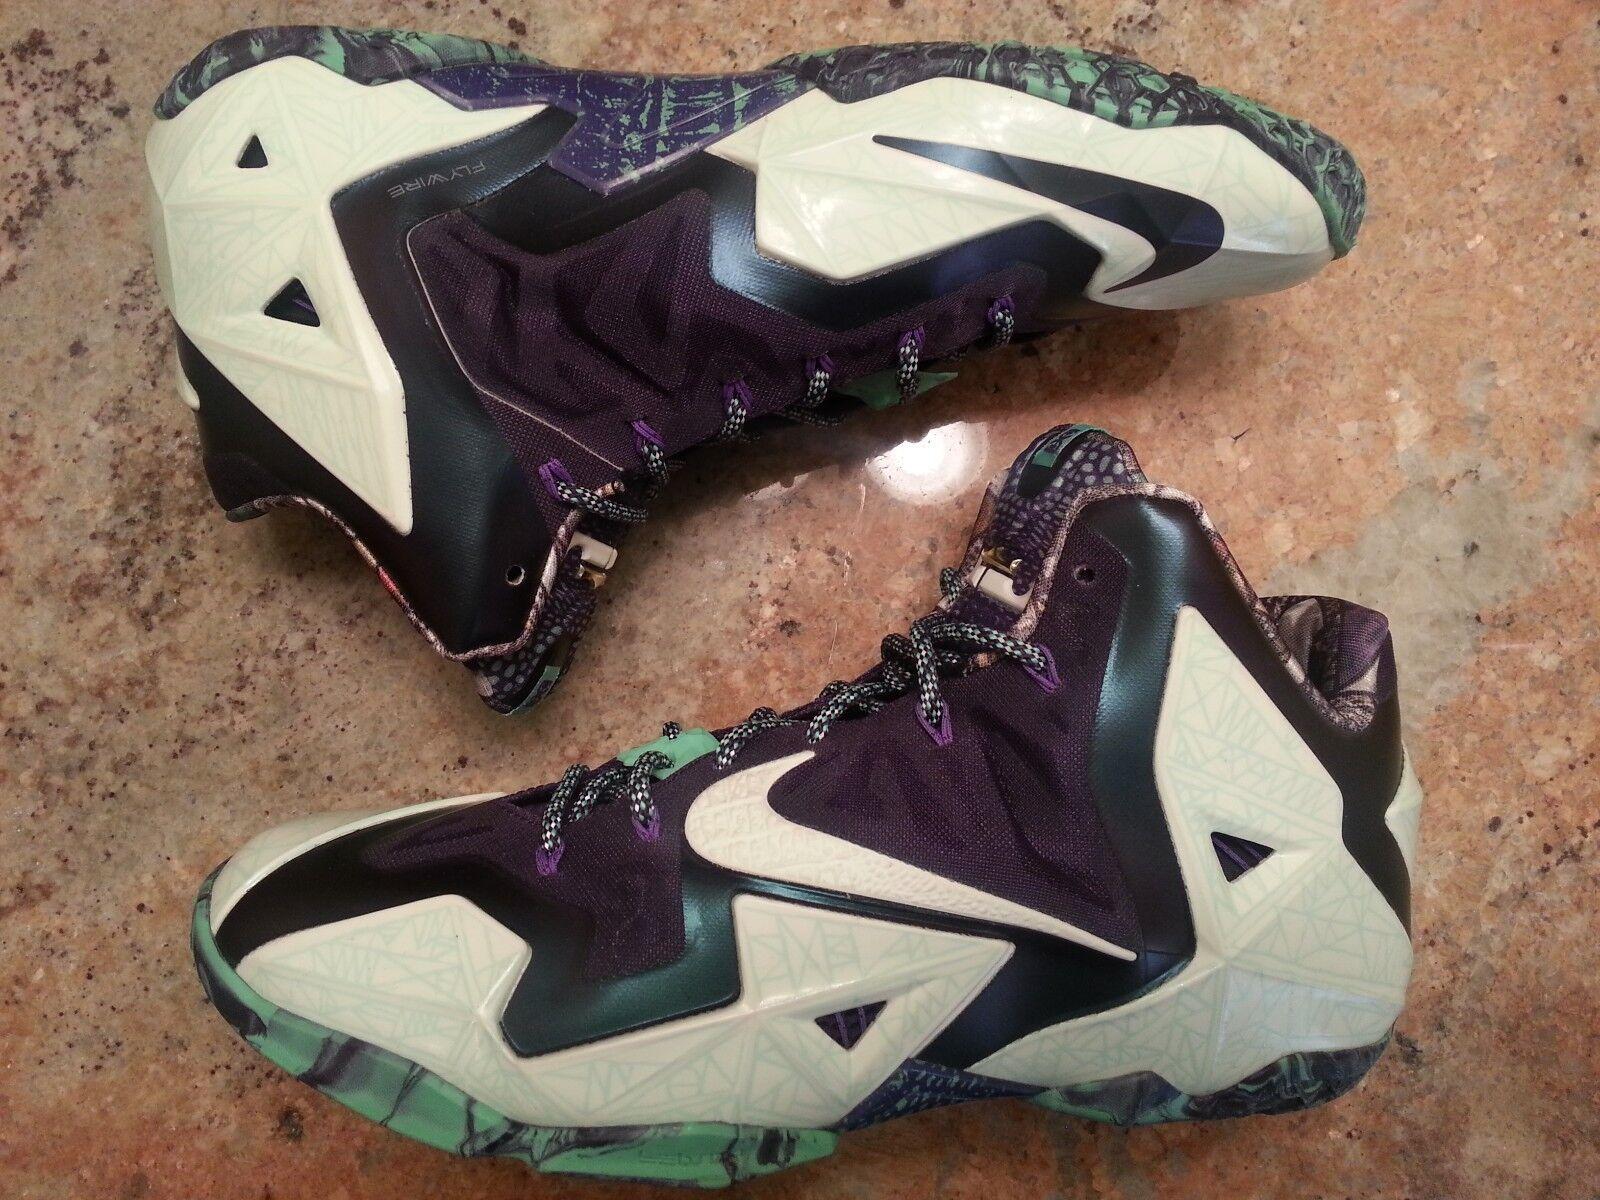 Nike lebron all 11 xi als all lebron - star - gumbo größe 13.647780-735.weiß - lila.bhm 4801f2